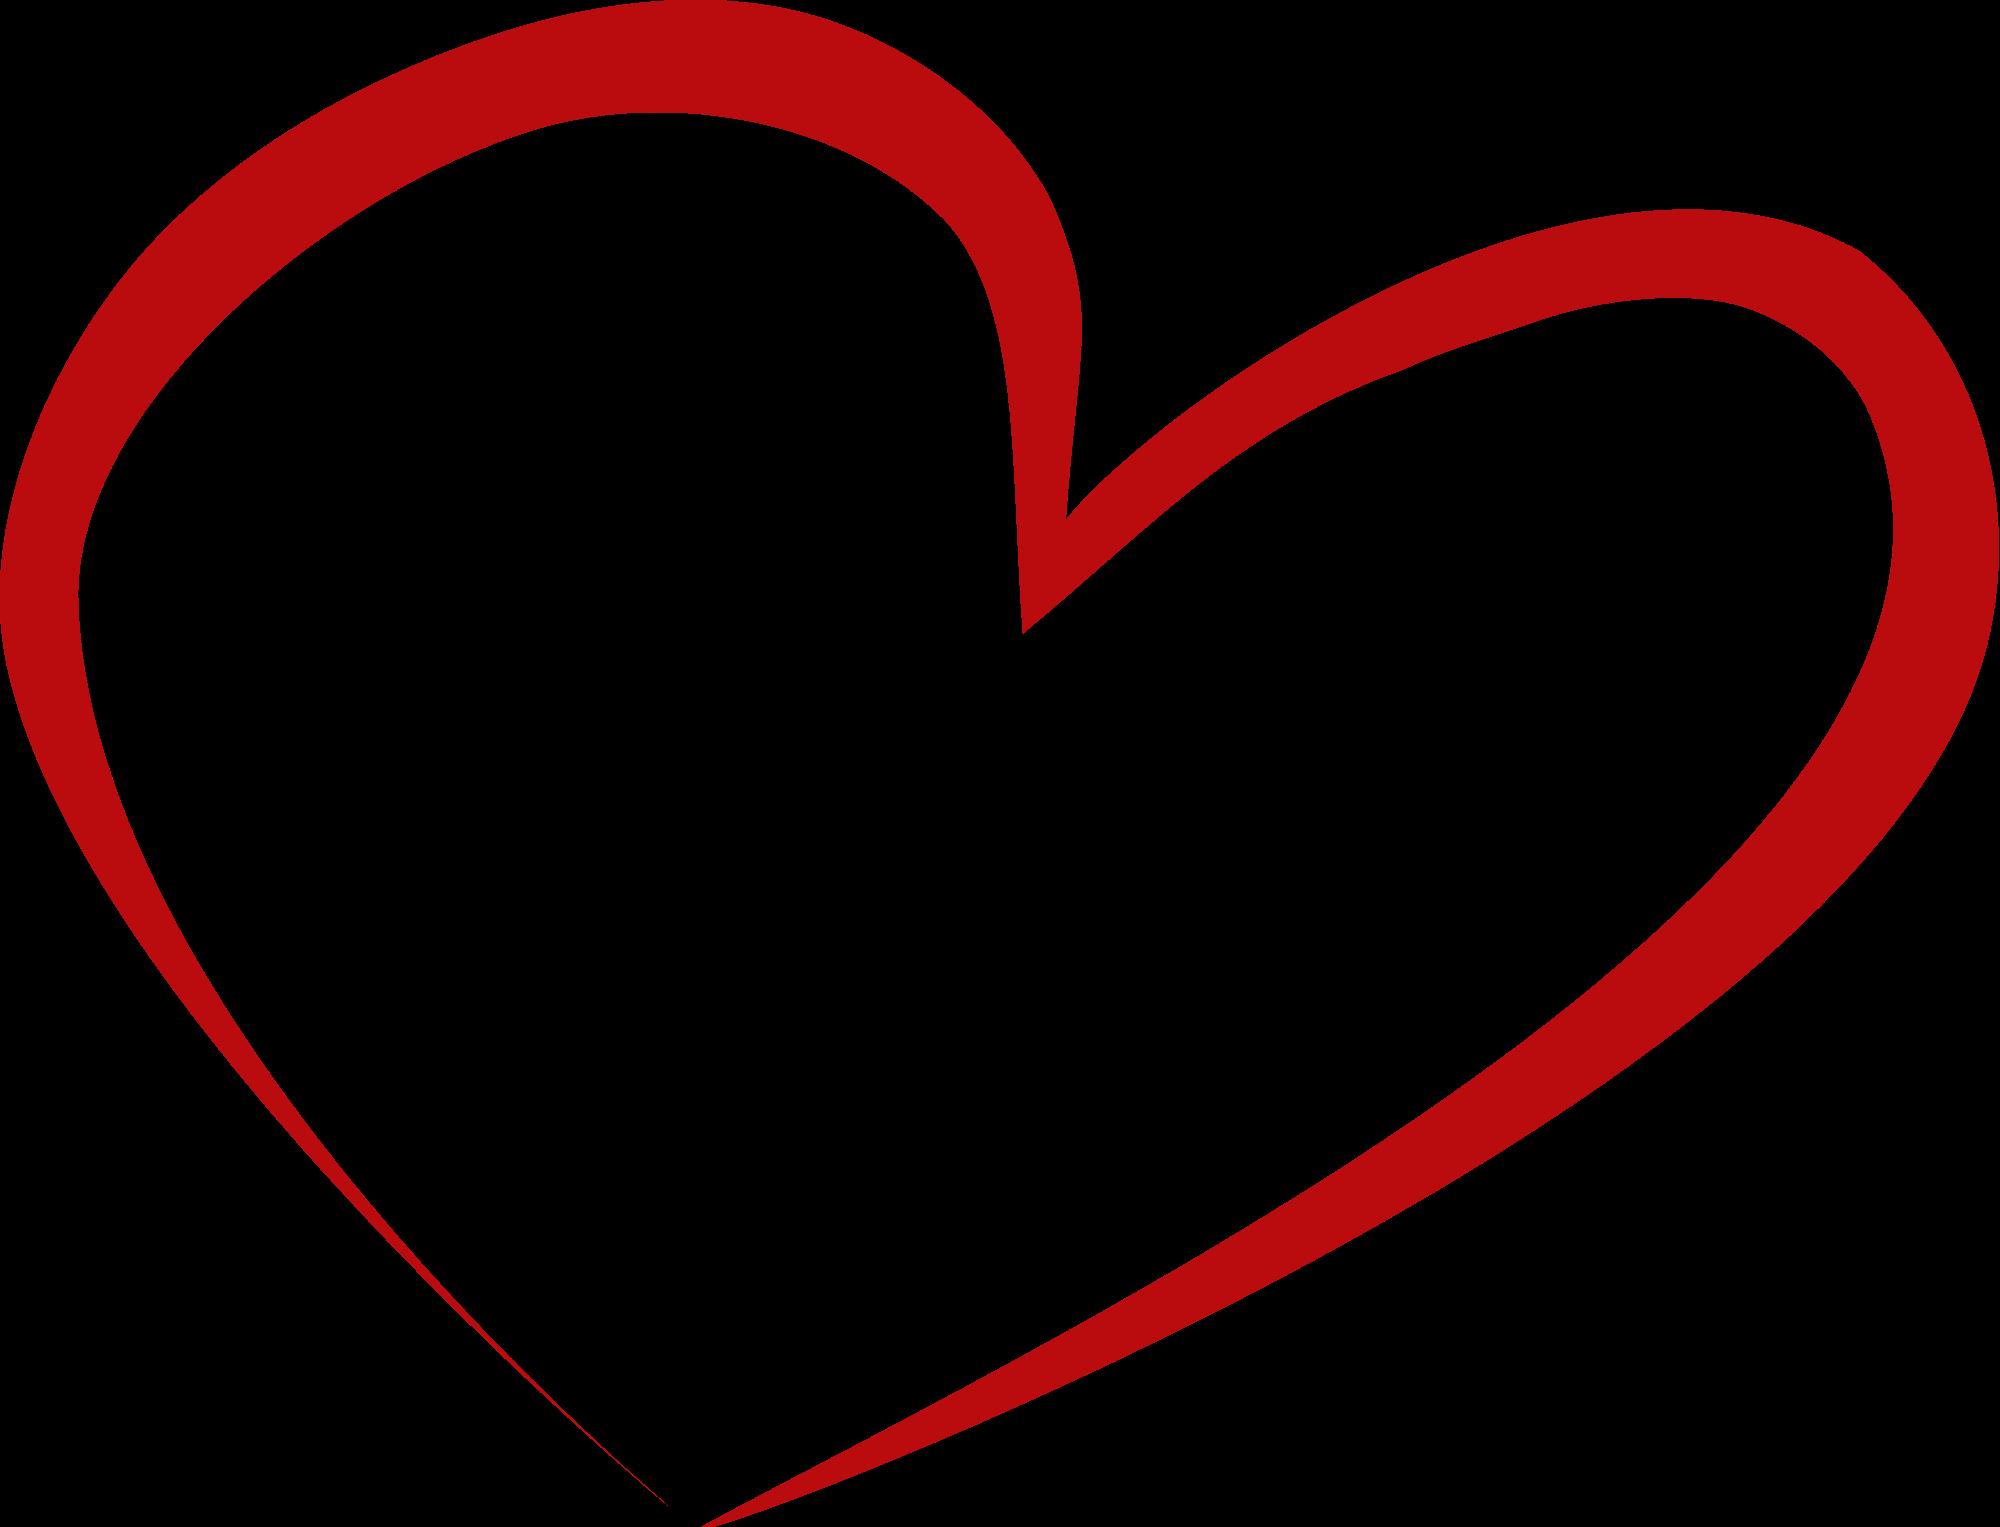 Heart-shaped clipart open heart #4